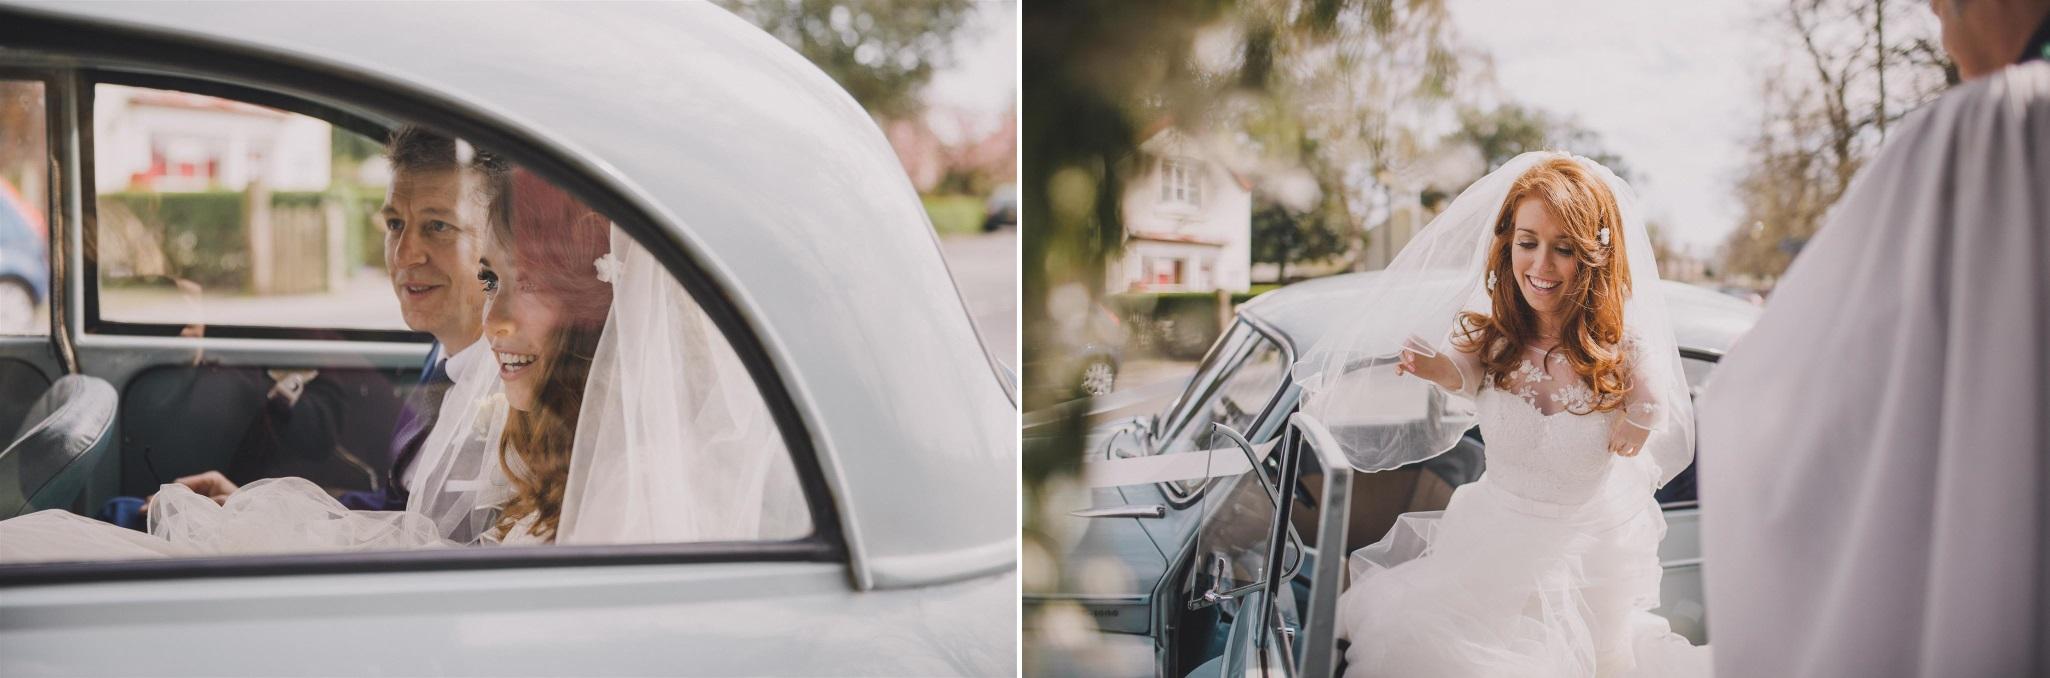 Bride Arriving - A Spring 1960s Inspired Wedding